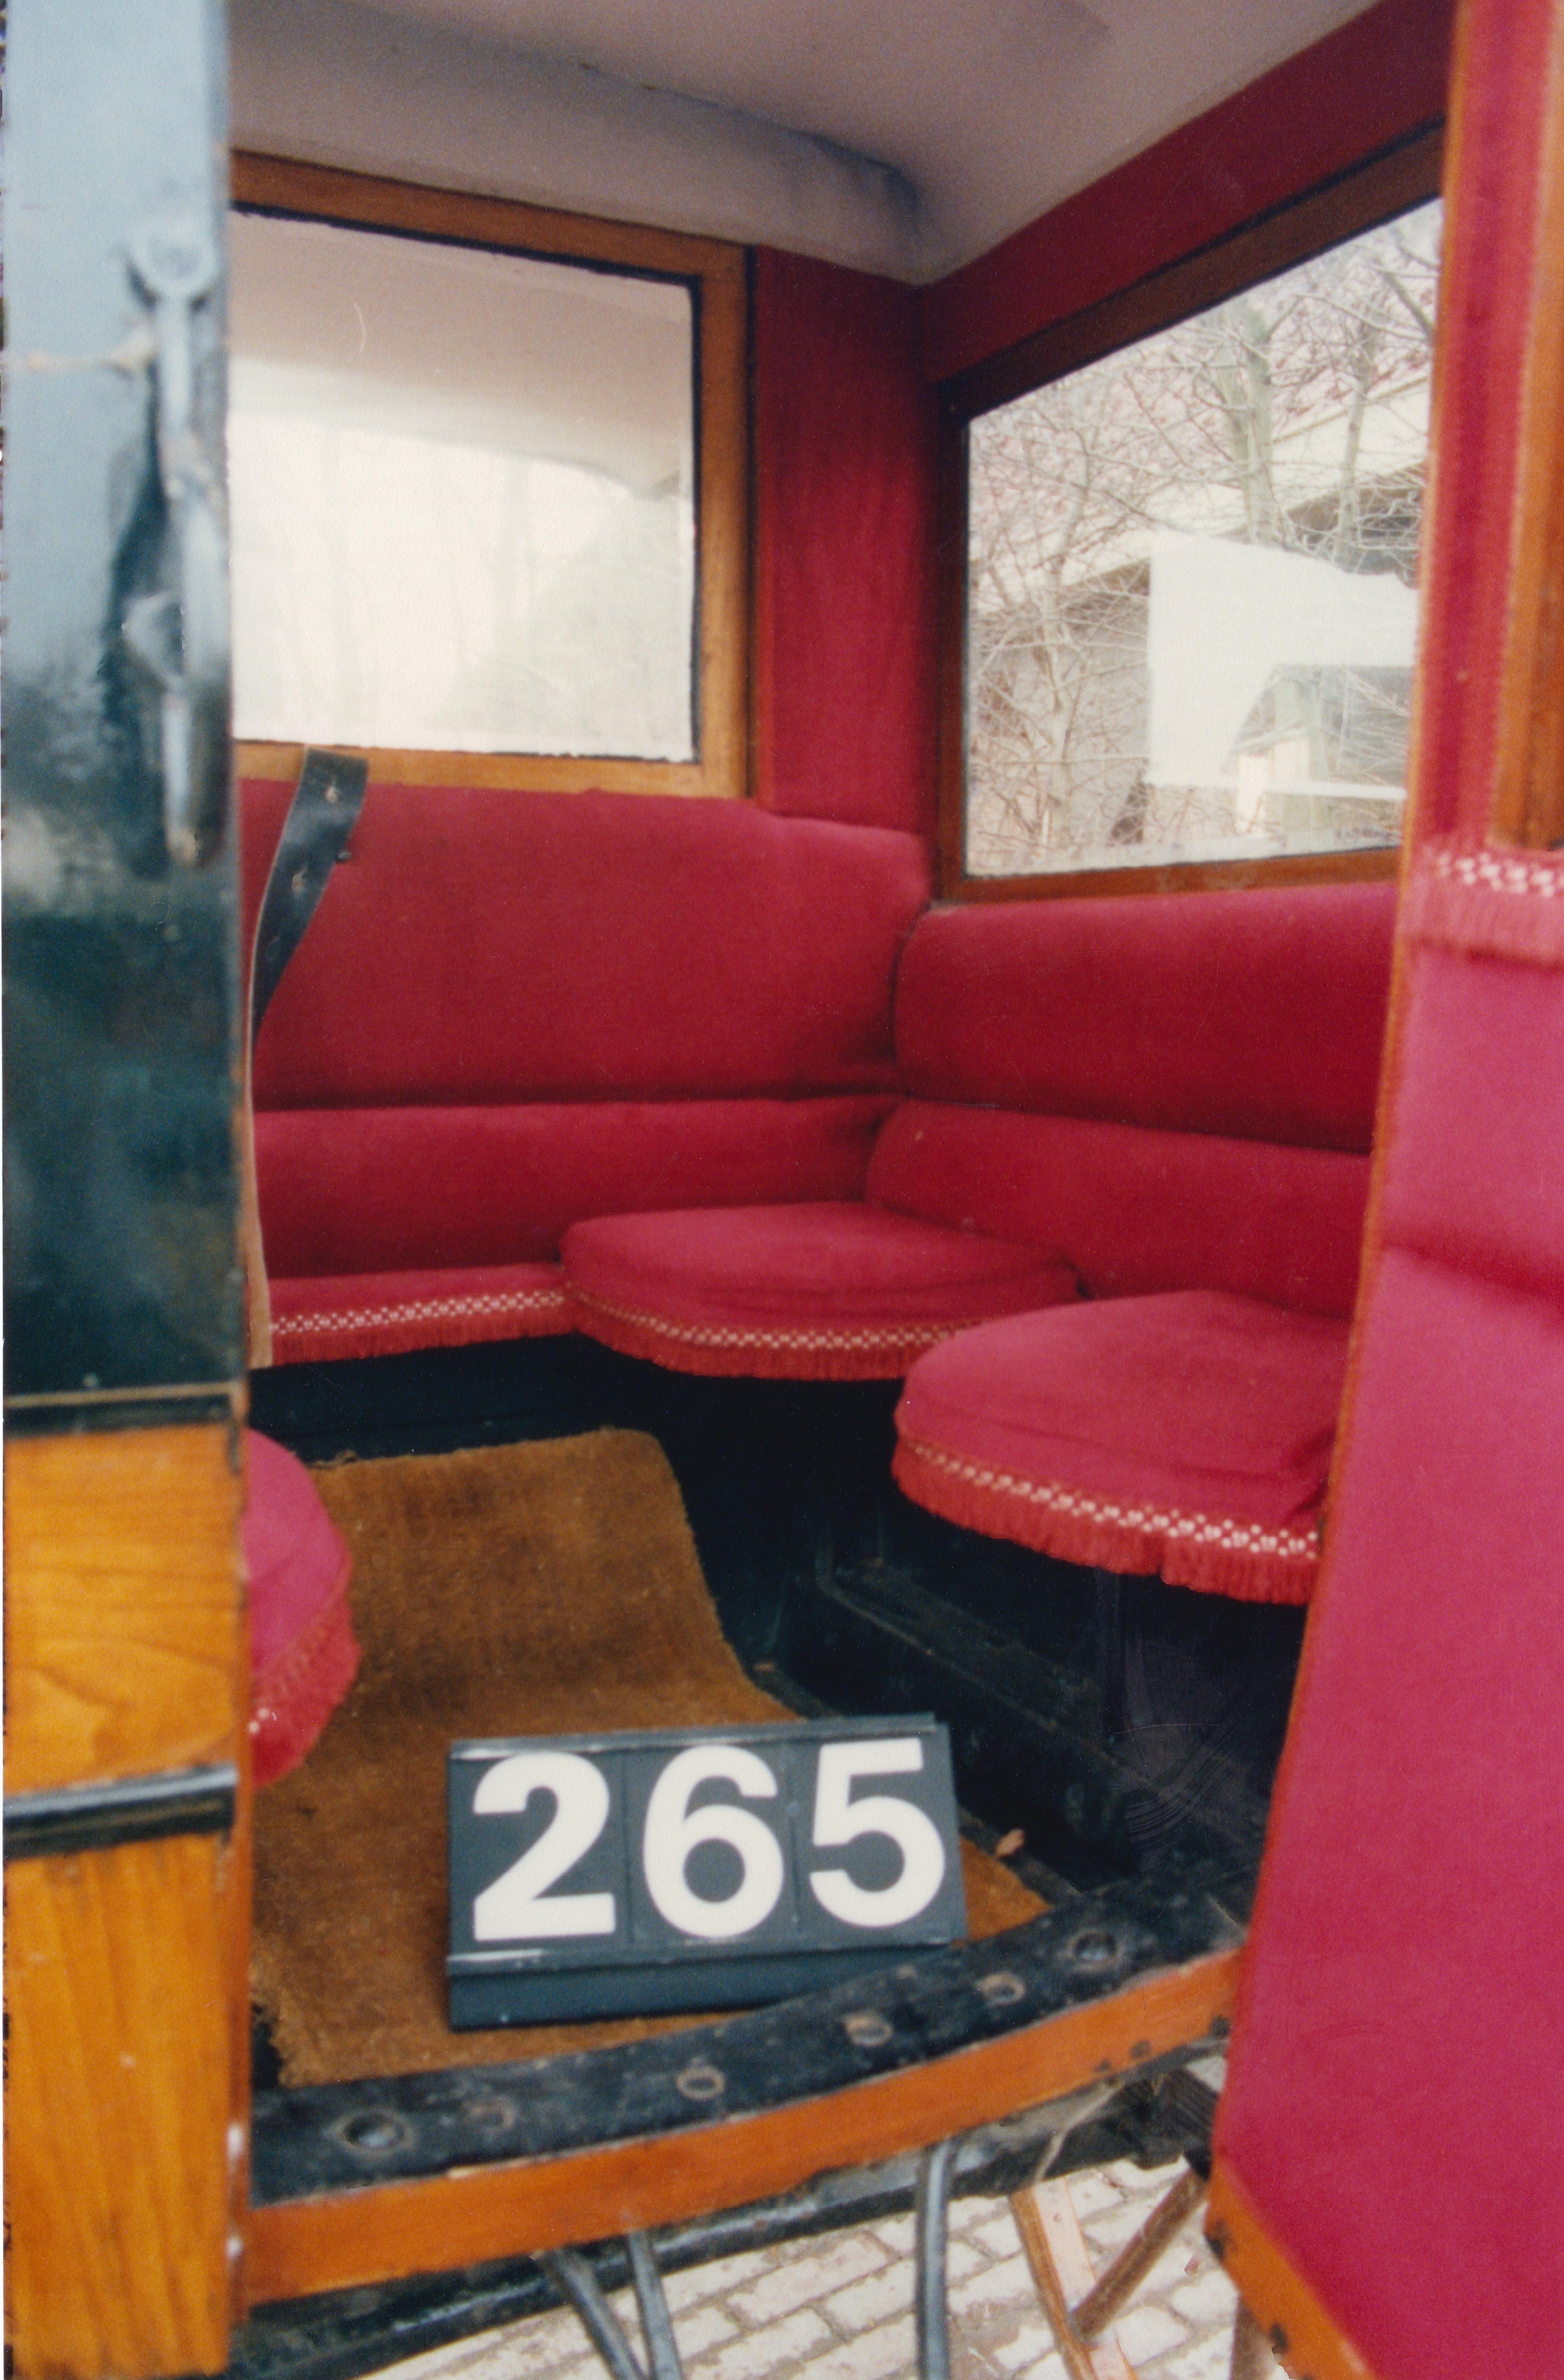 DNR029.jpg